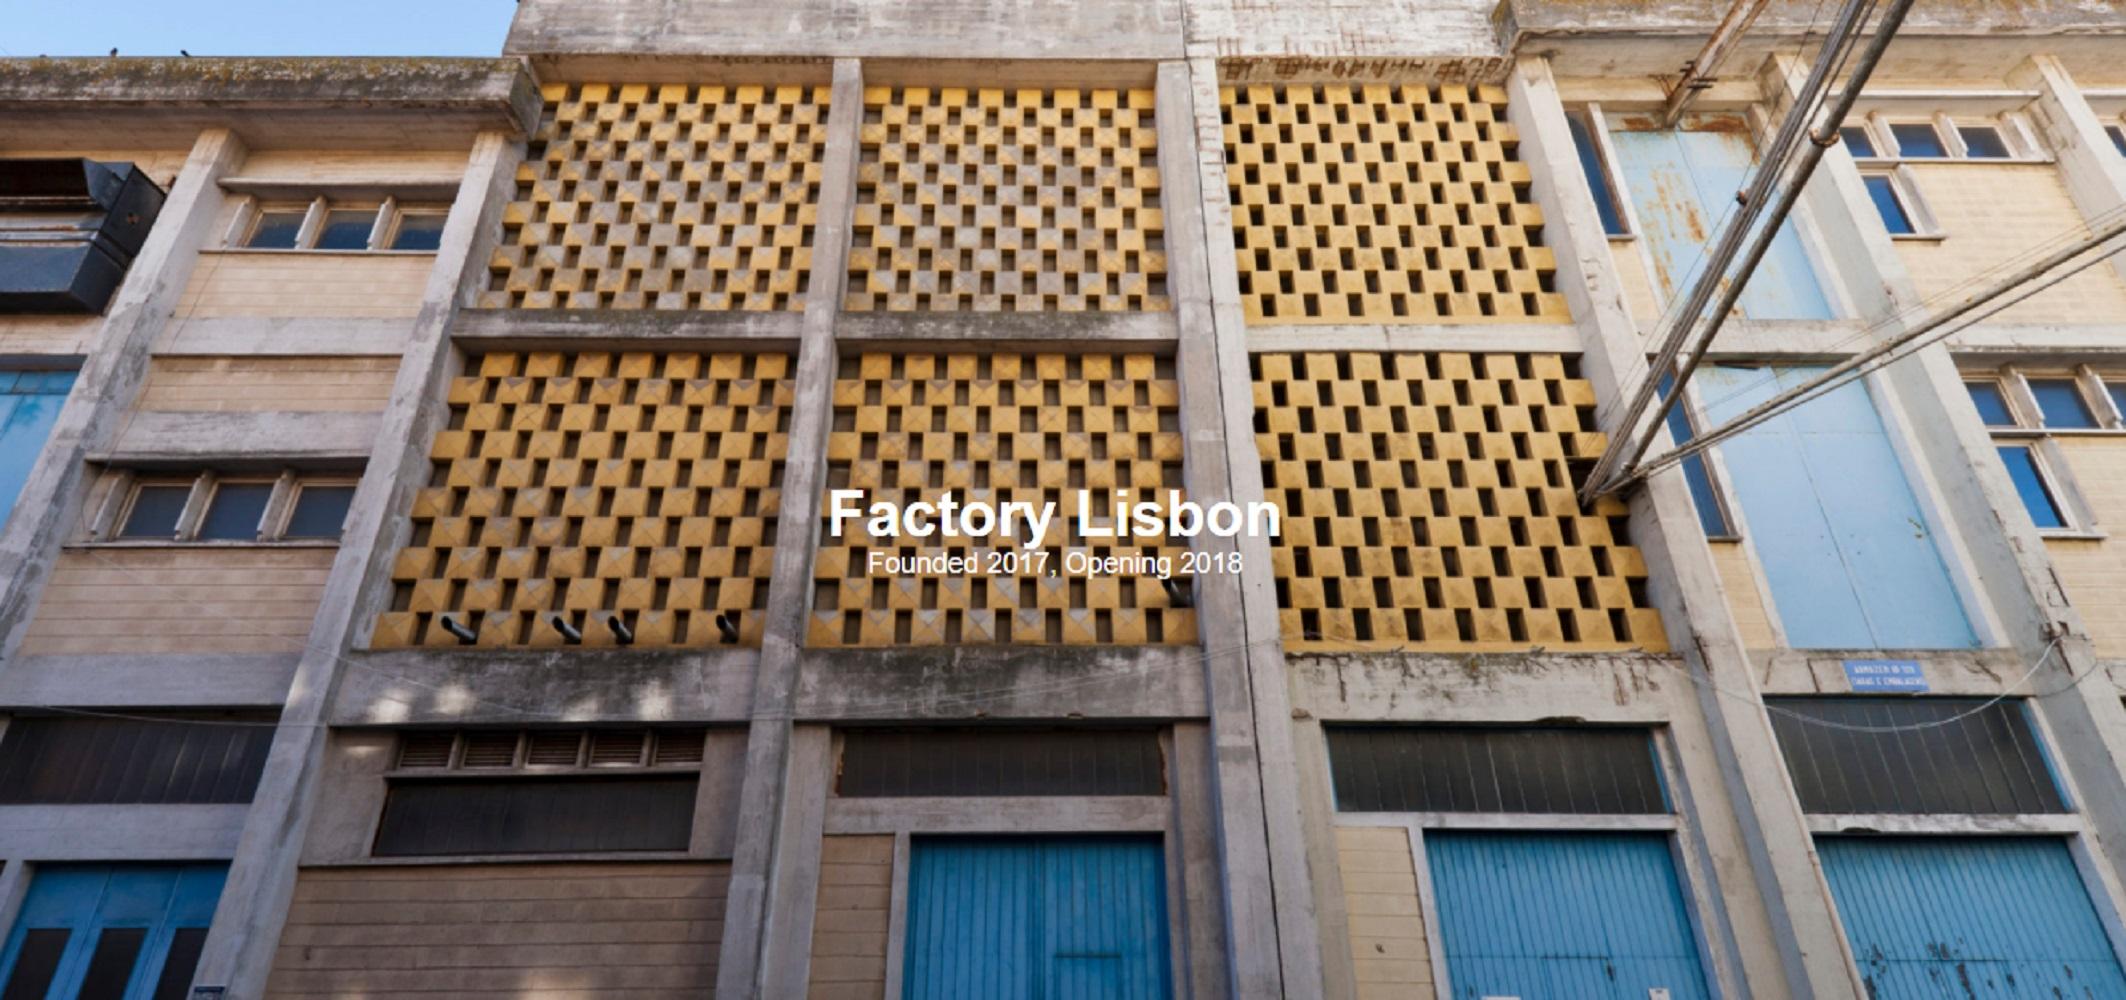 Factory Lisbon.jpg